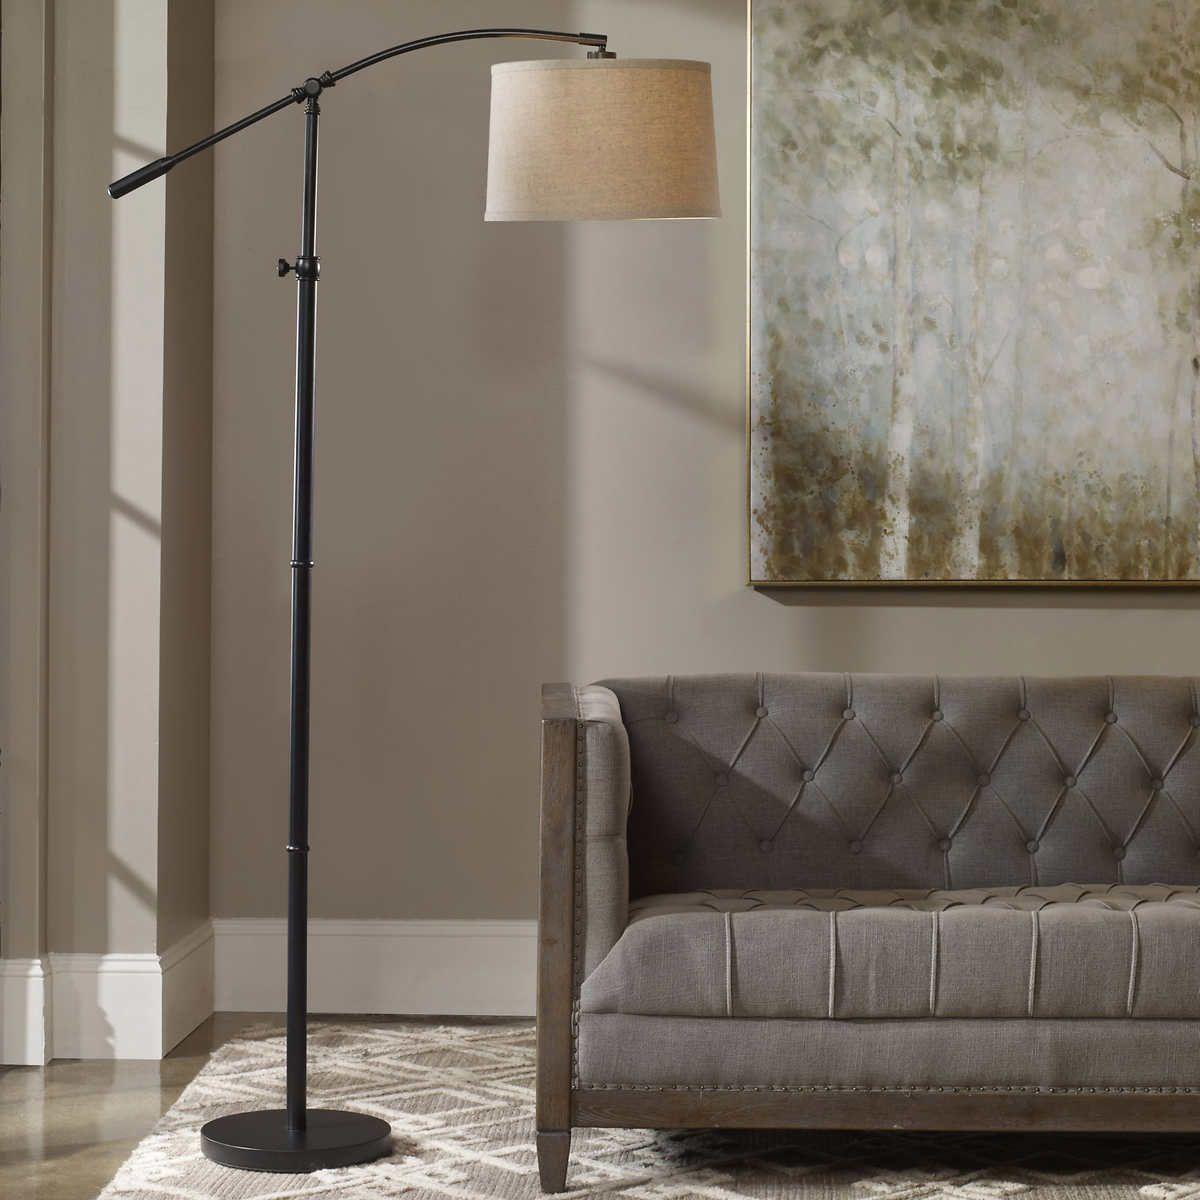 Jackson Floor Lamp Tall floor lamps, Home decor, Floor